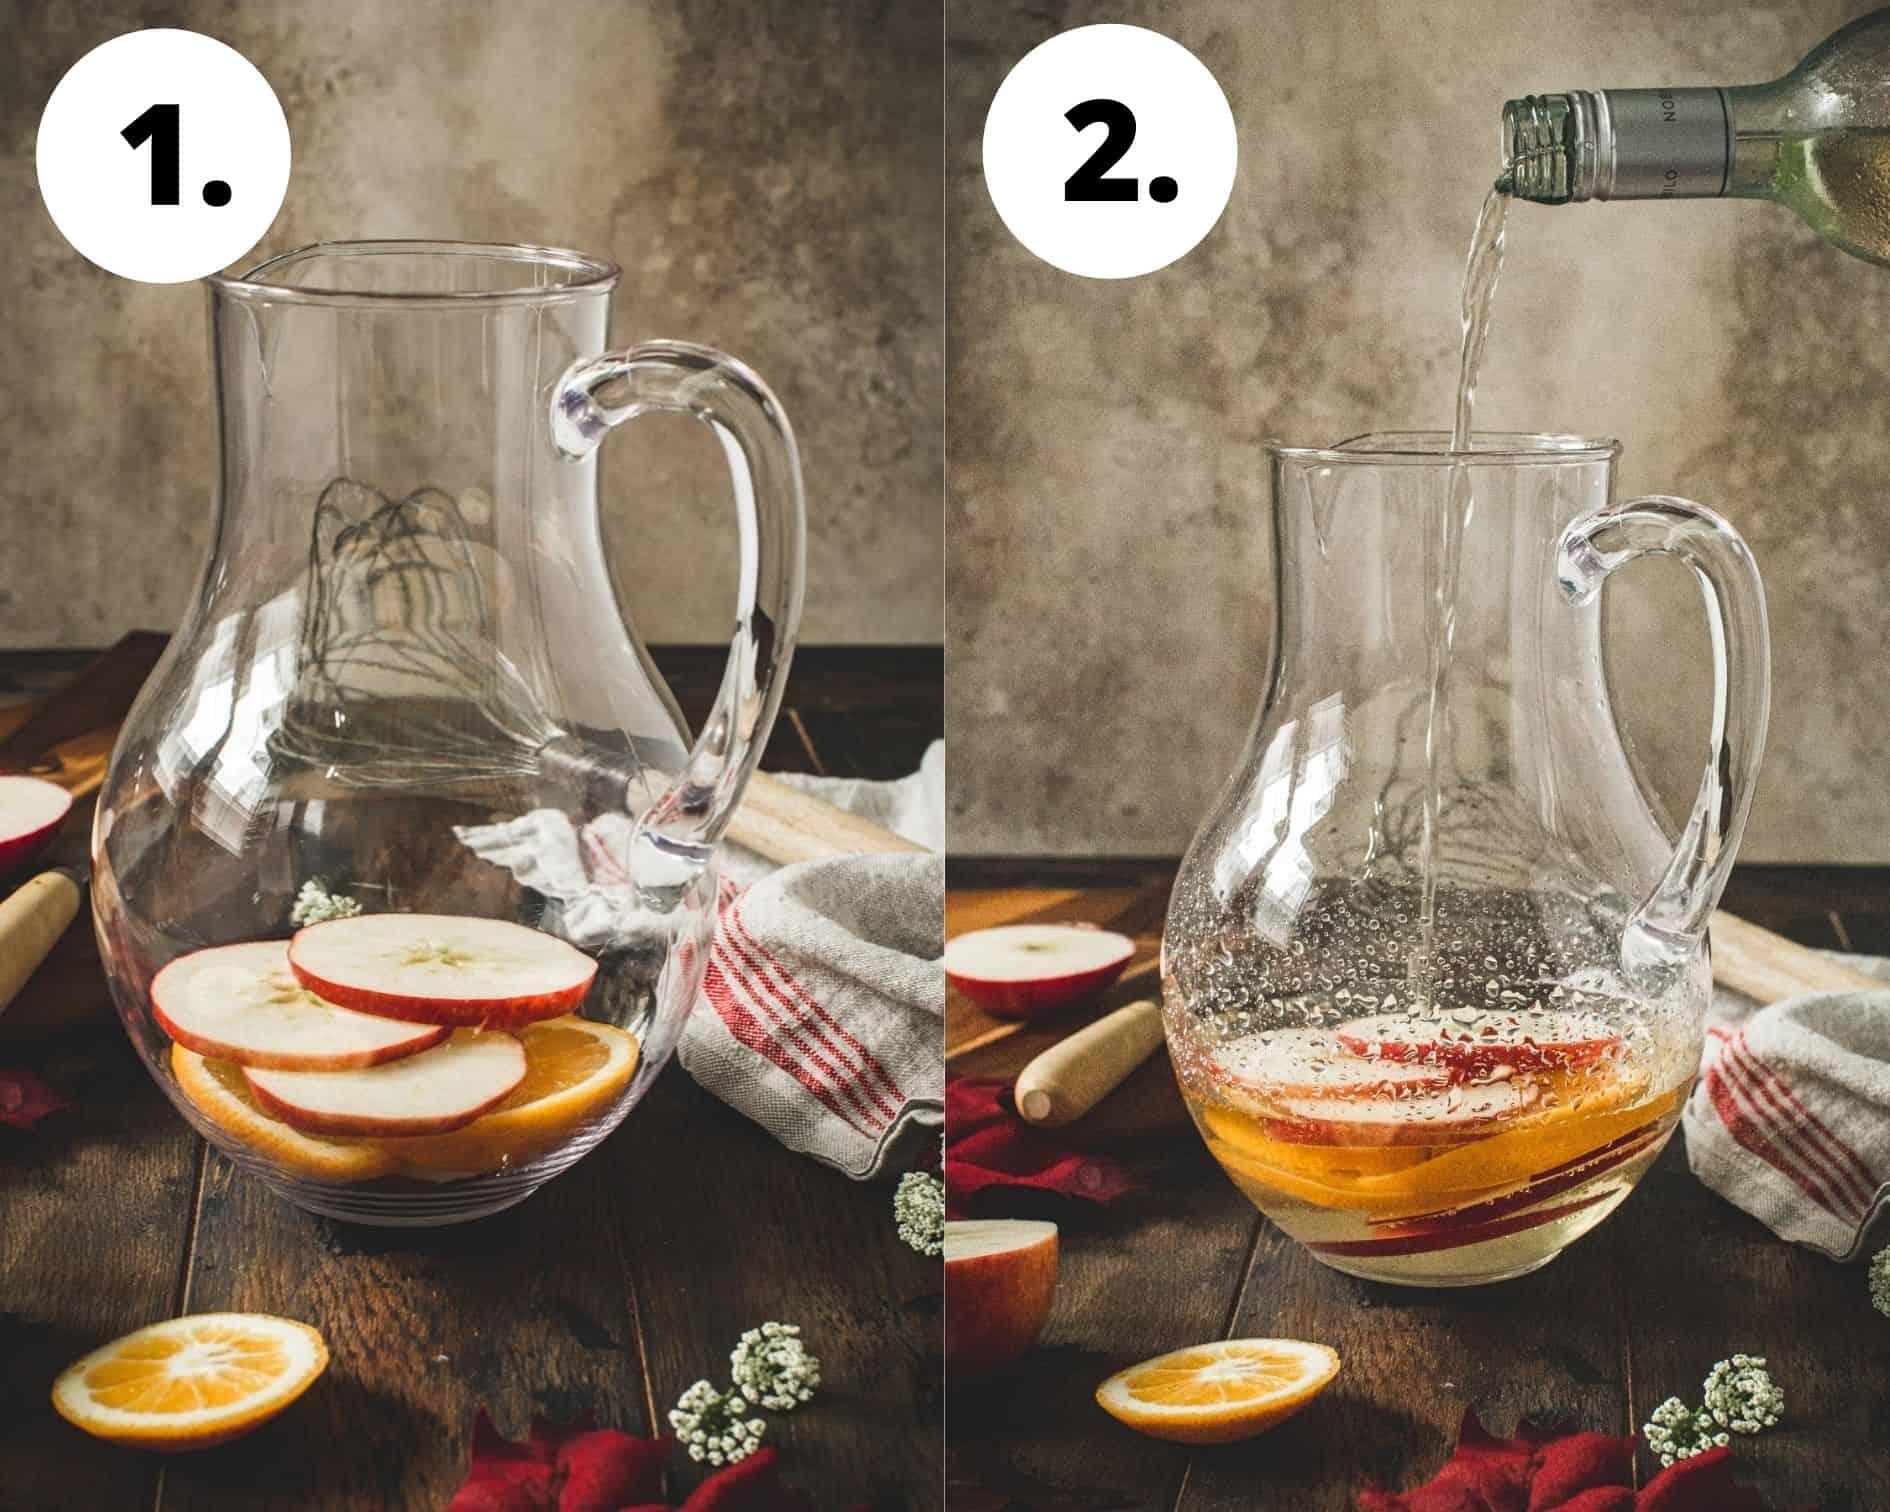 Caramel apple sangria process steps 1 and 2.